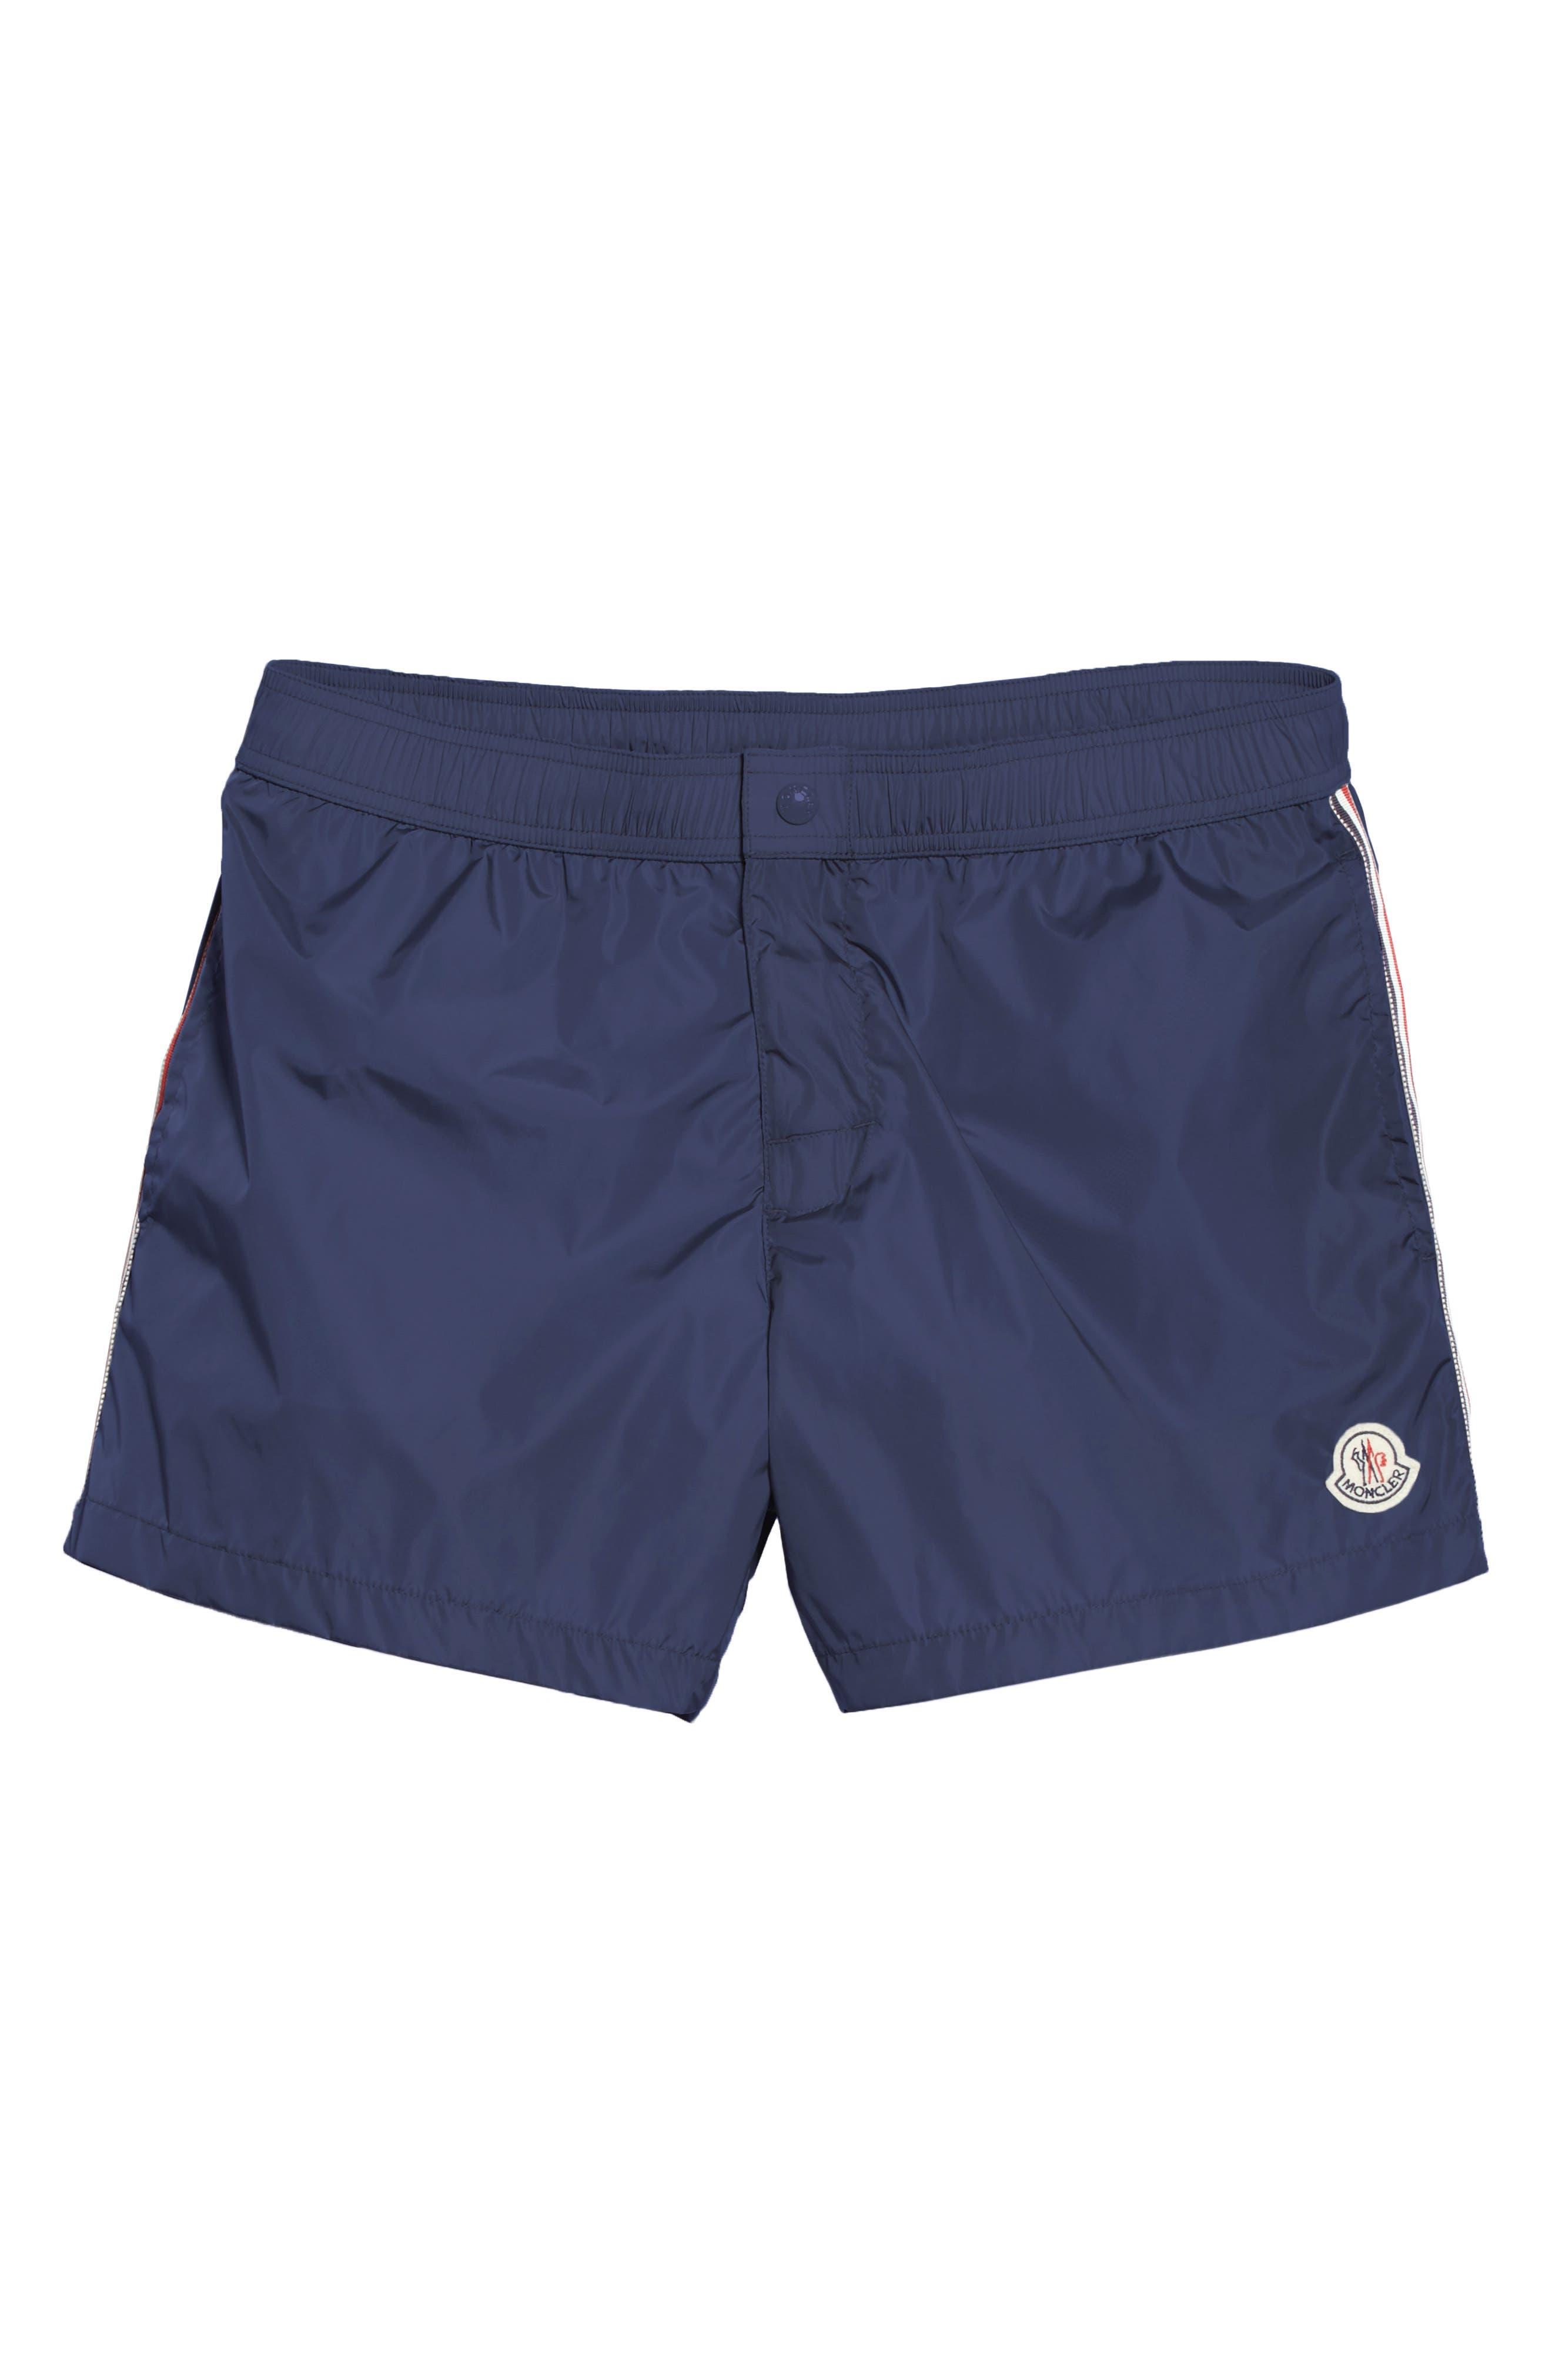 MONCLER, Boxer Mare Swim Shorts, Alternate thumbnail 6, color, BLUE